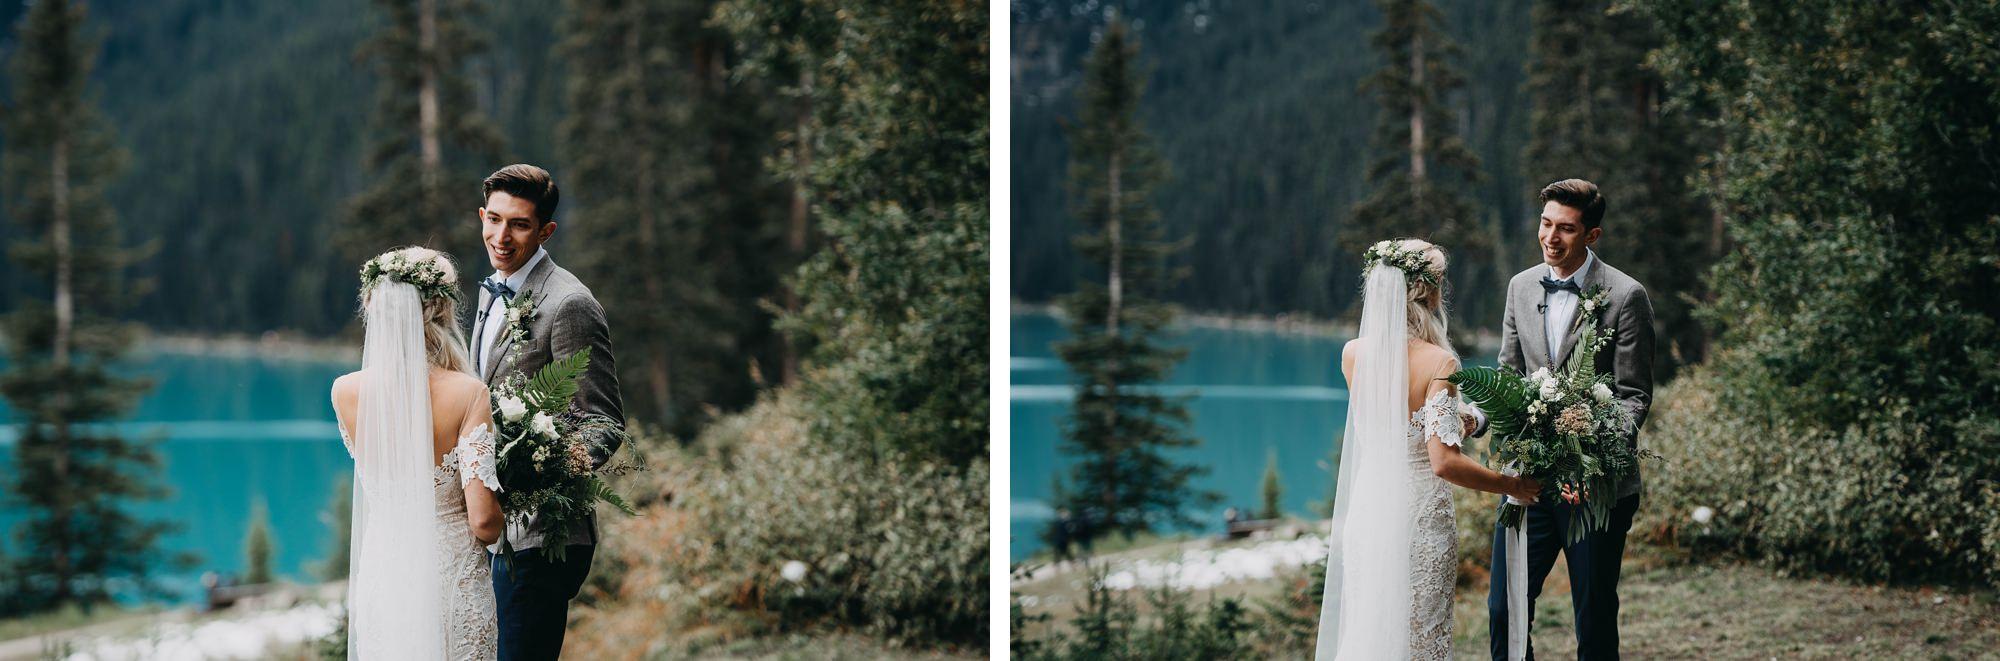 first look between boho couplea moraine lake elopement